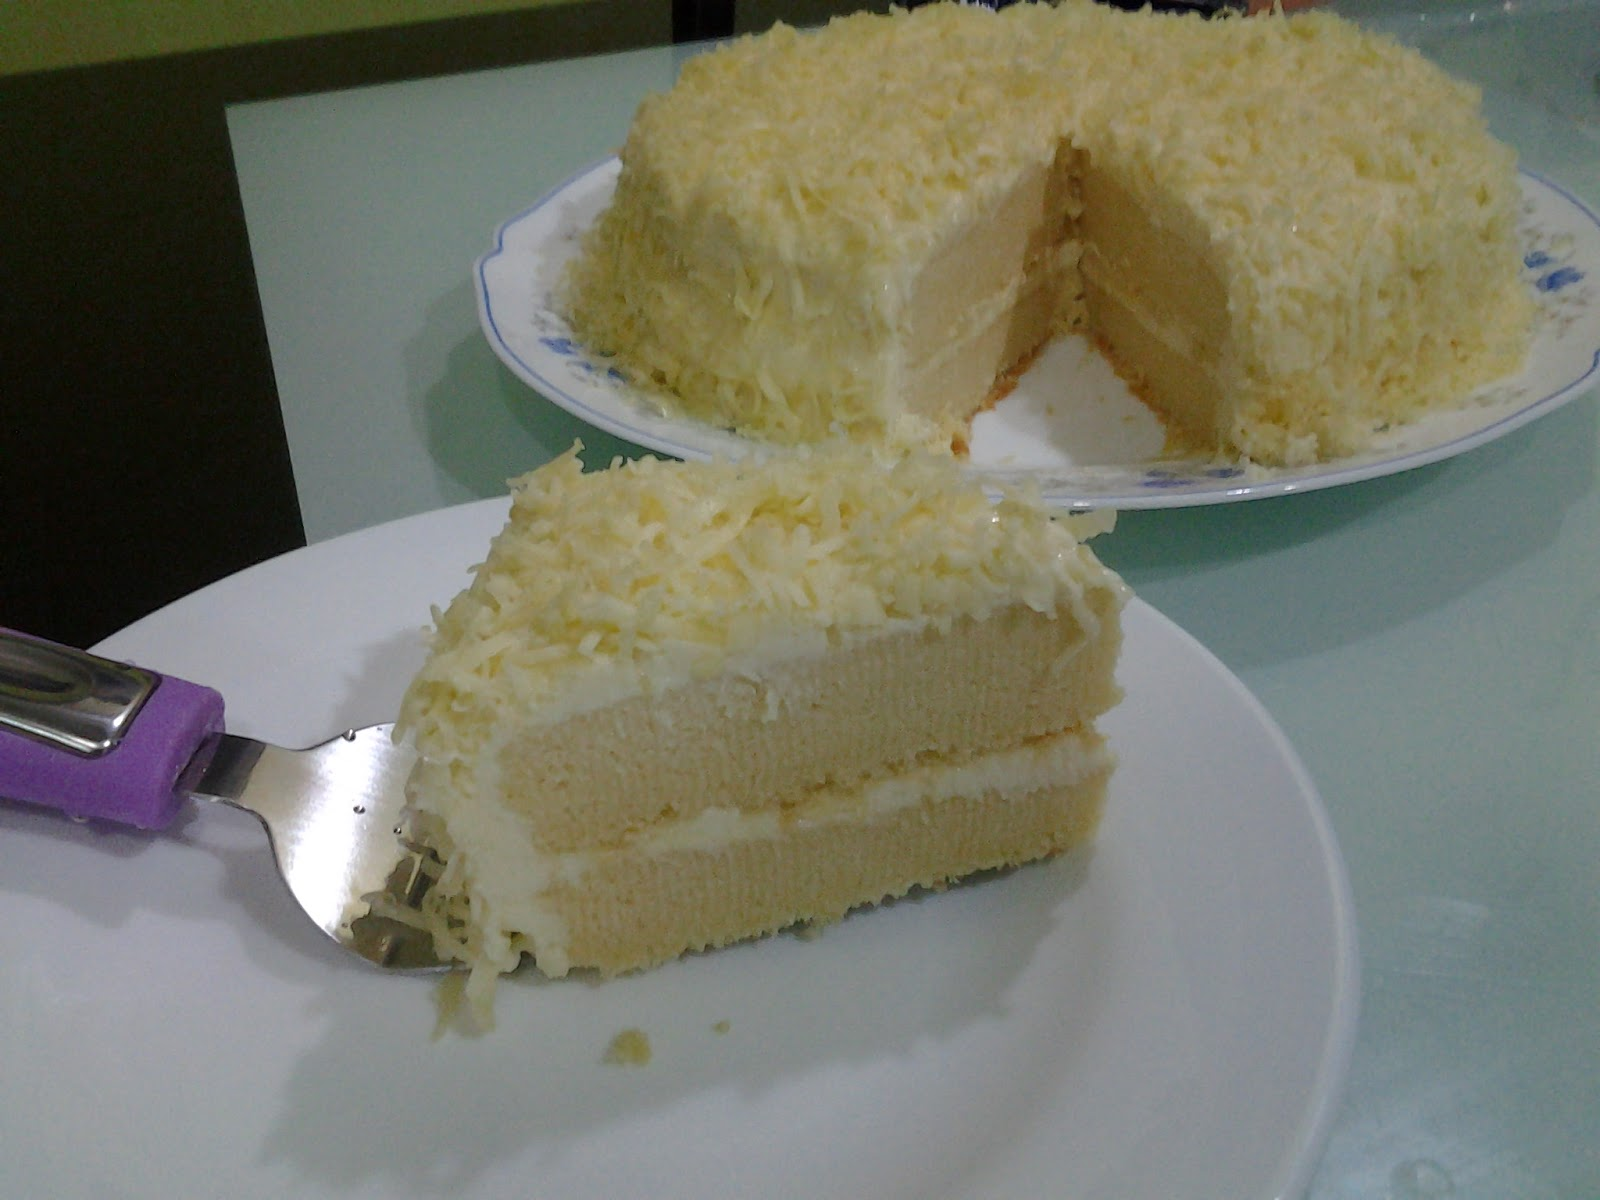 Deli sweetsour: SNOW CHEESE CAKE